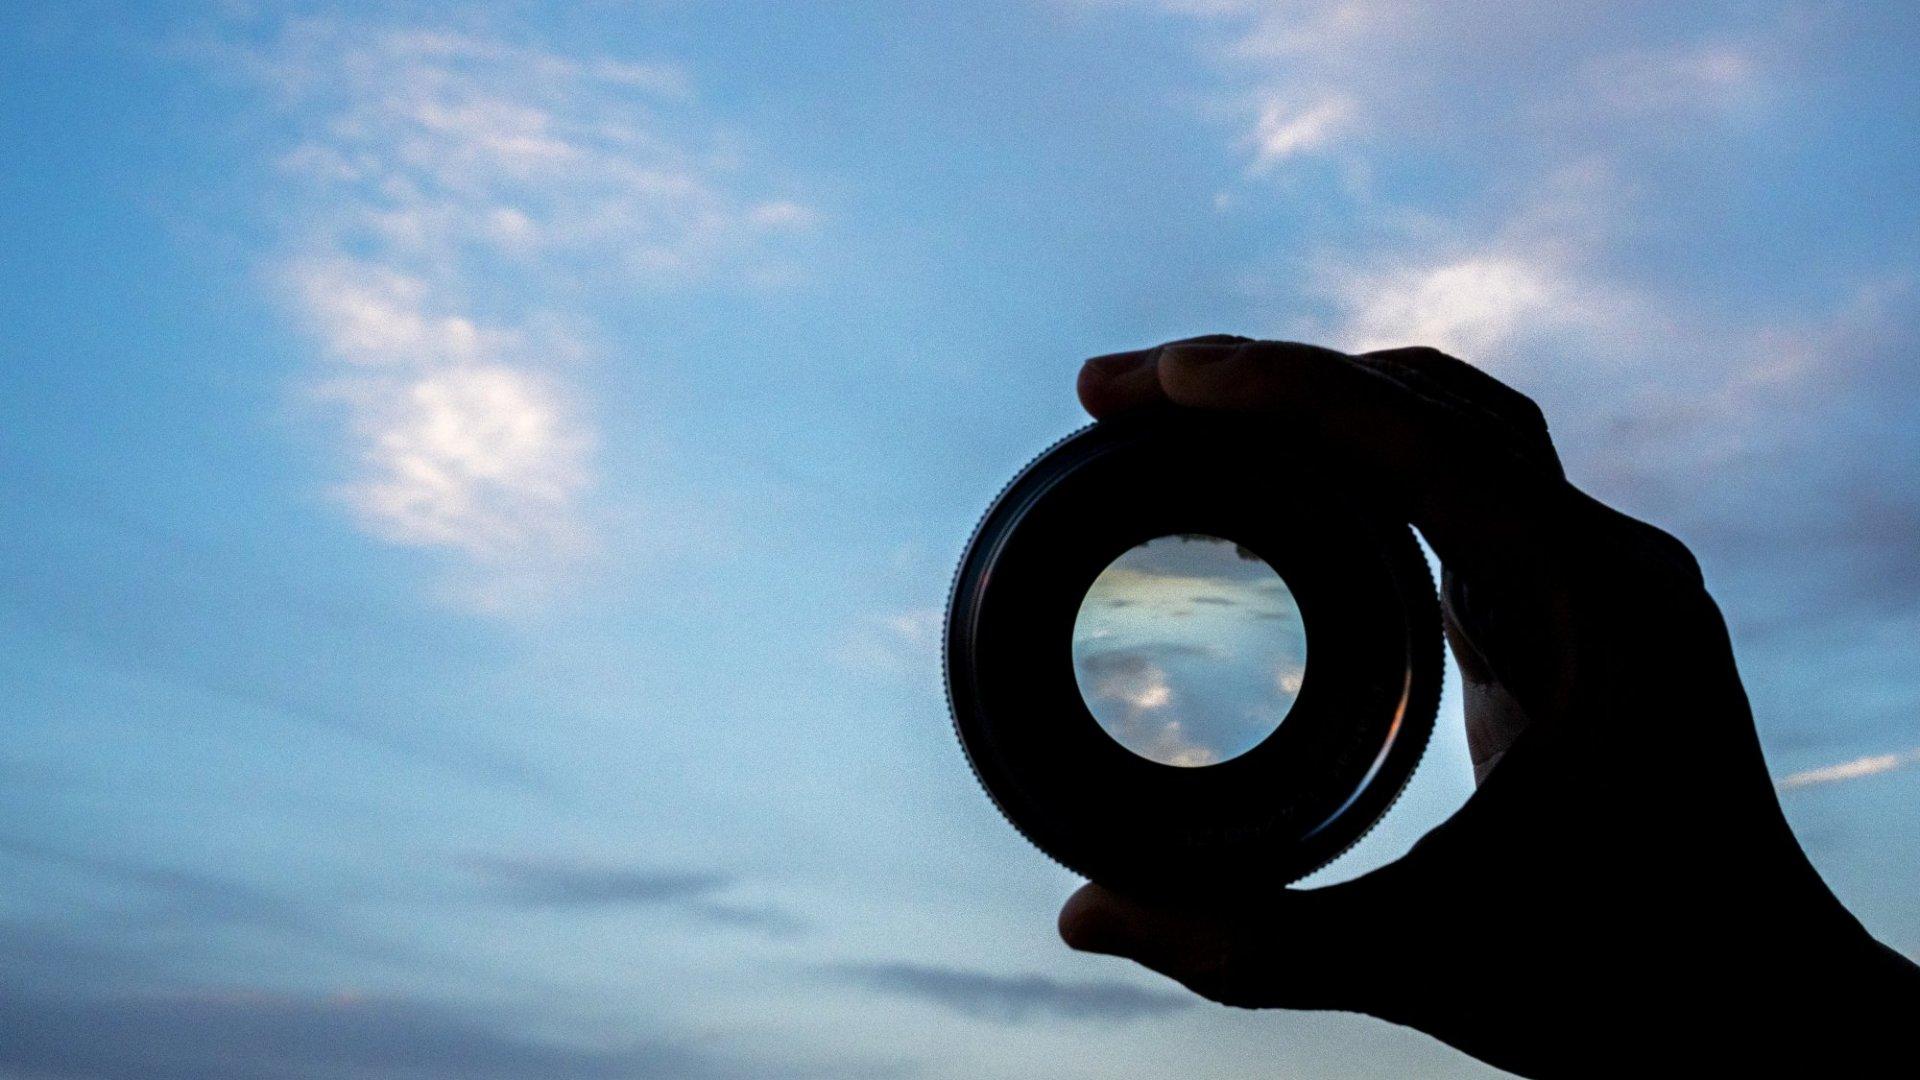 3 StepsRay Dalio Uses Radical Transparency to Build a Billion-Dollar Company